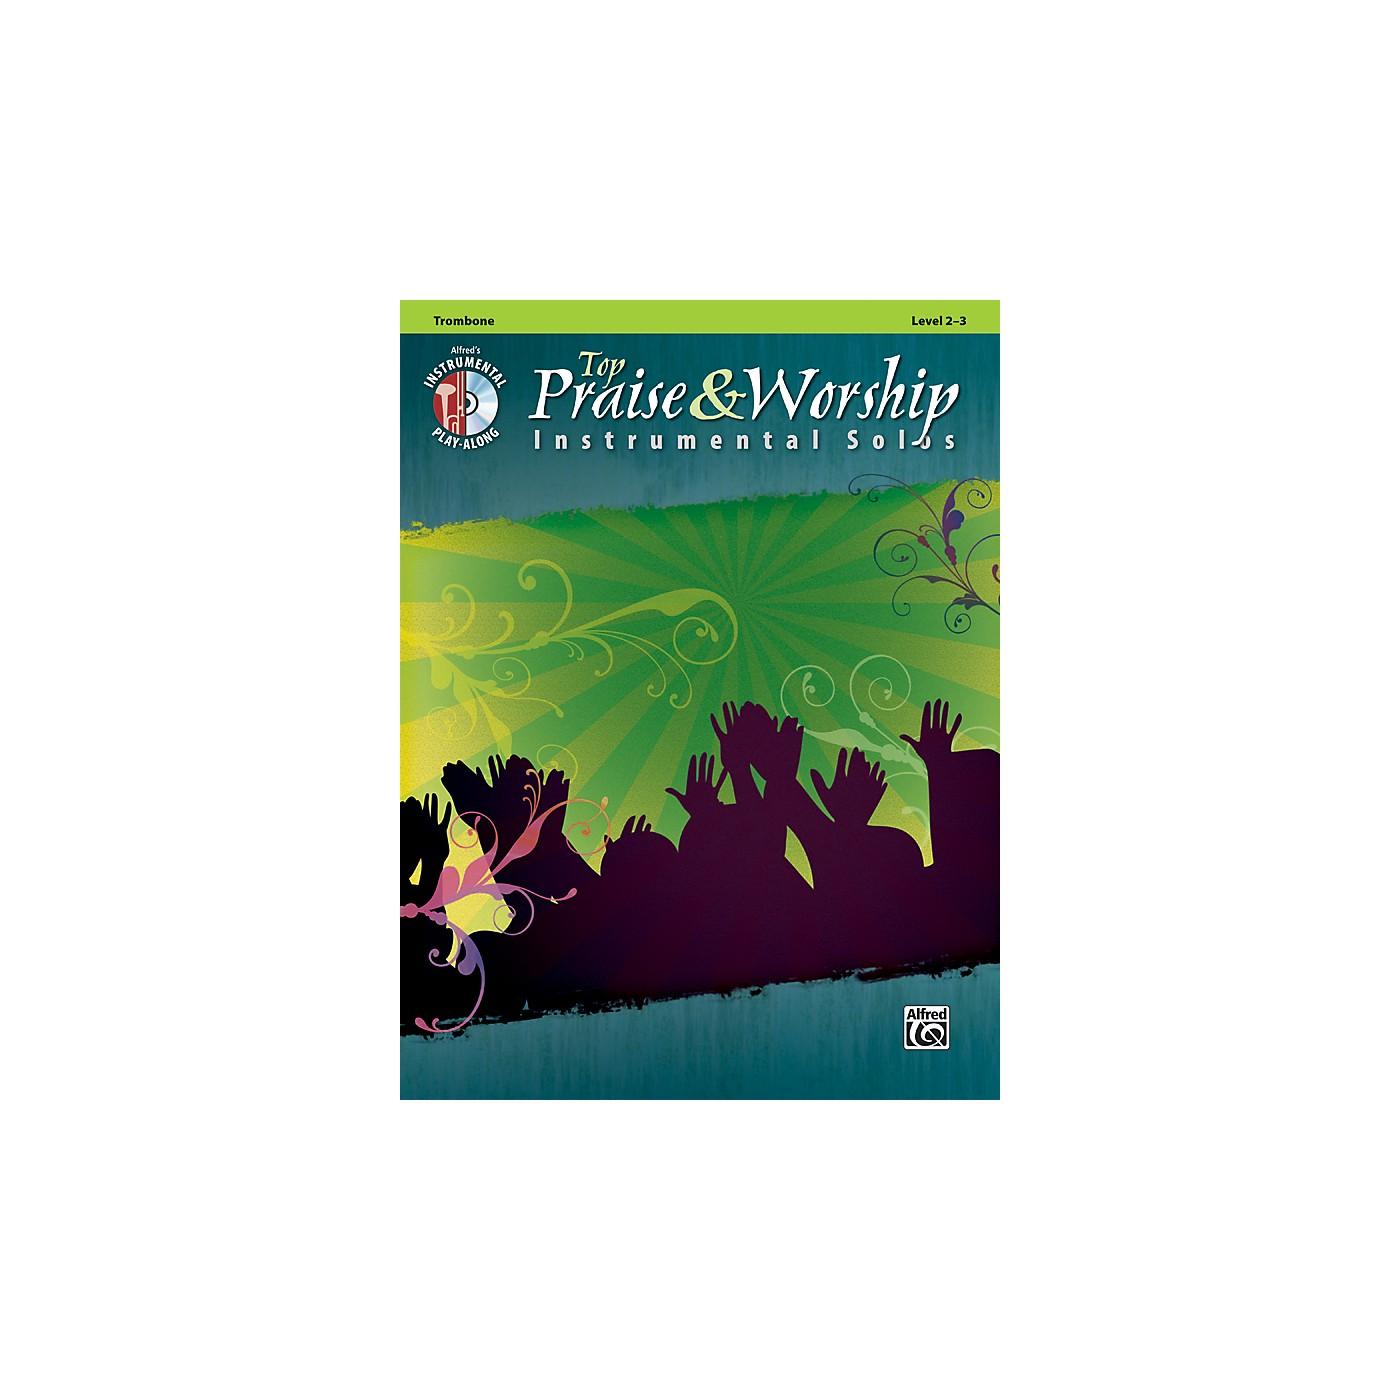 Alfred Top Praise & Worship Instrumental Solos - Trombone, Level 2-3 (Book/CD) thumbnail